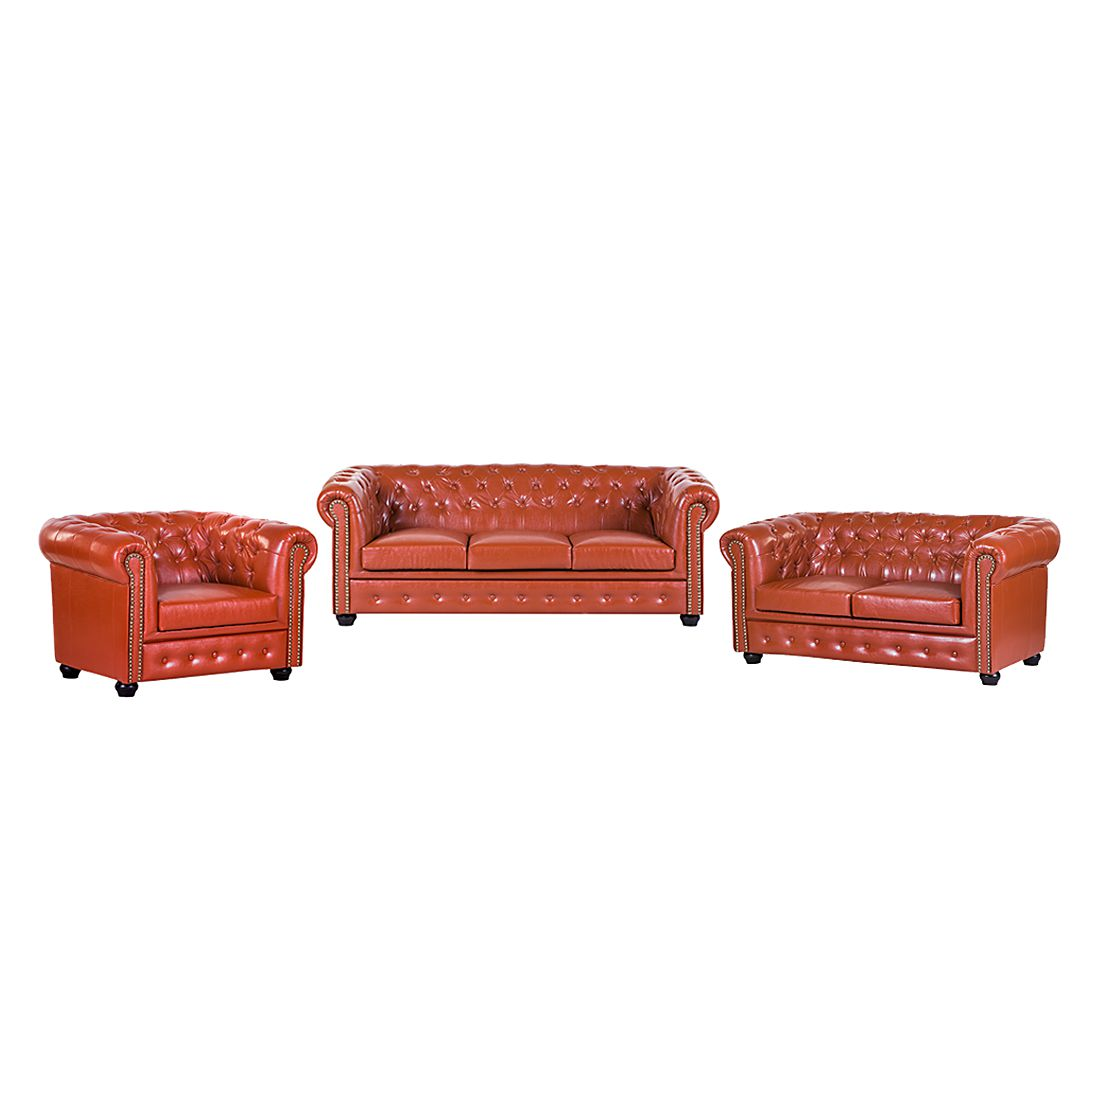 Canapé panoramique Torquay (3 -2 -1) - Imitation cuir marron, Jack and Alice